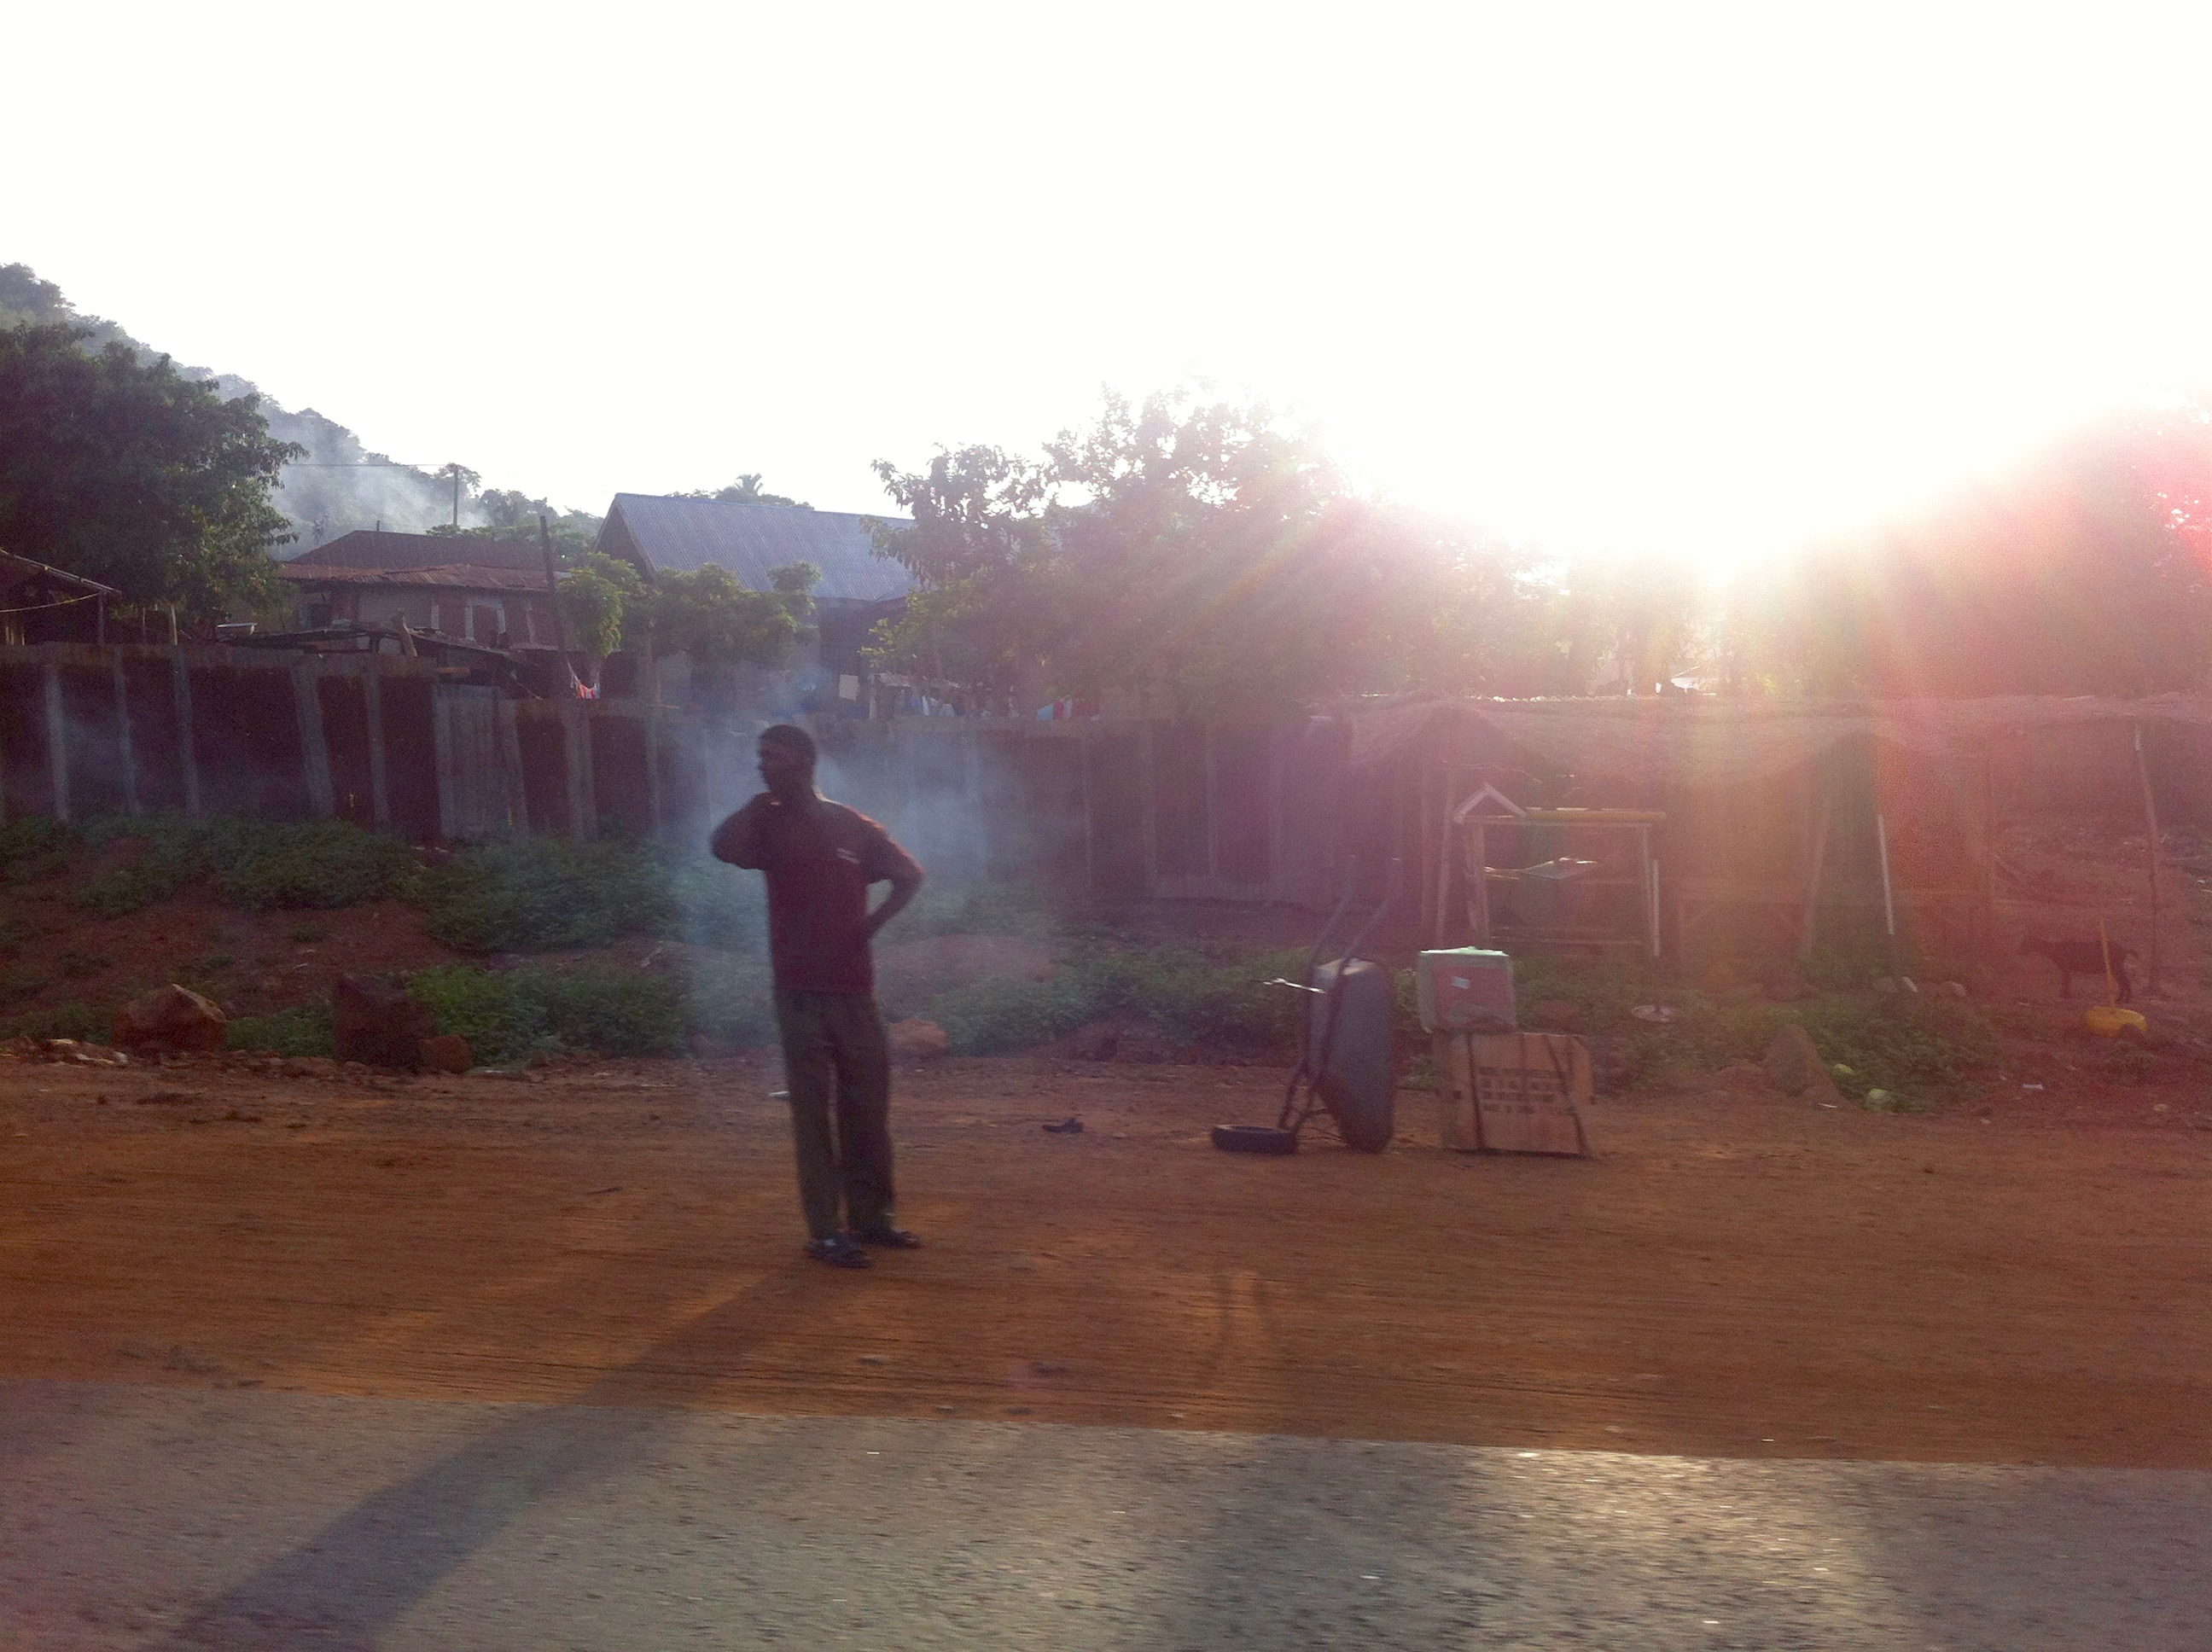 Sunrise in Koton Karifi, Kogi, Nigeria. #JujuFilms